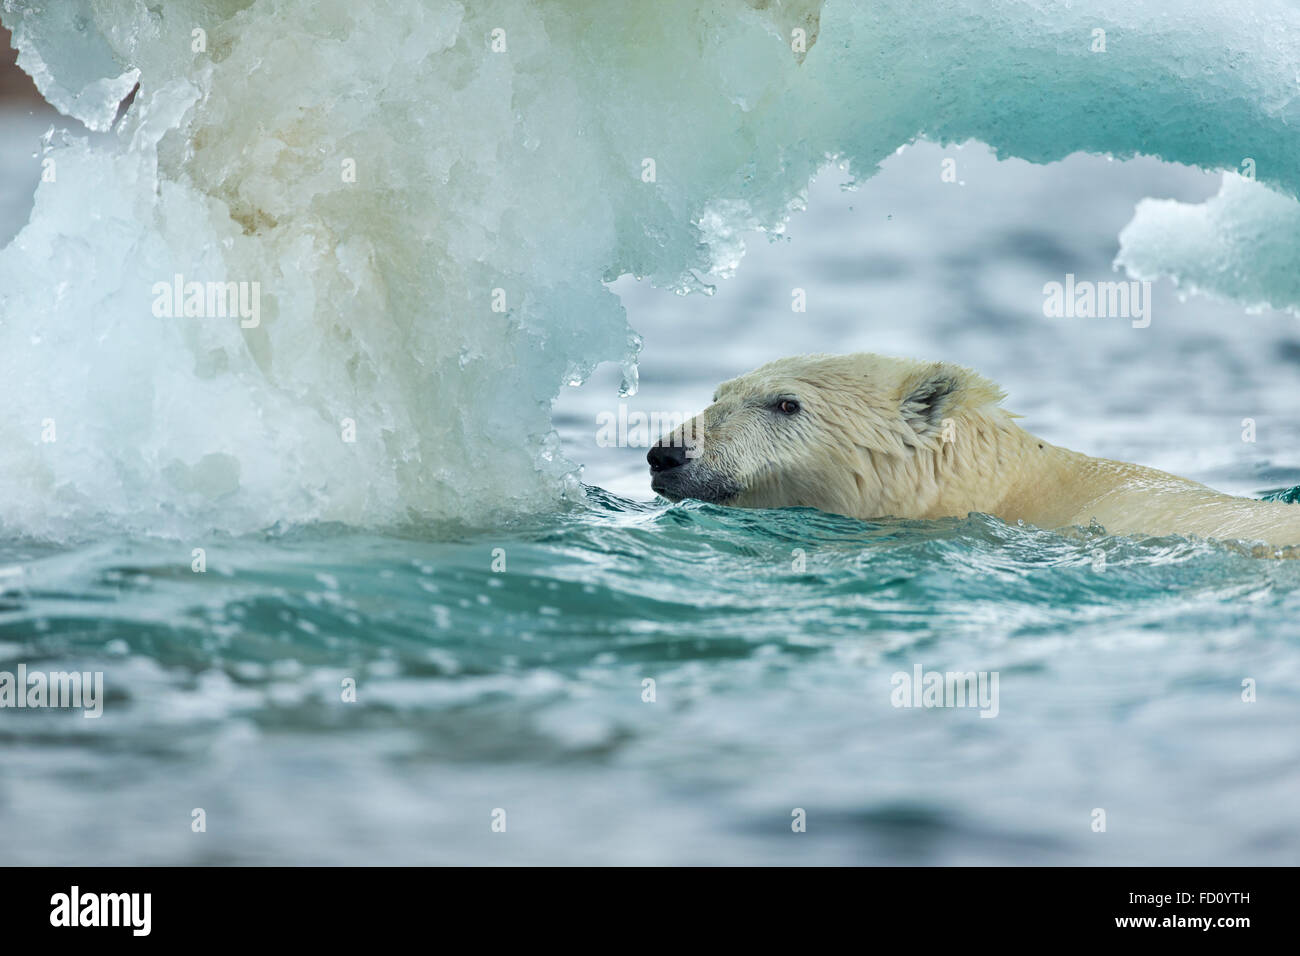 Canada, Nunavut Territory, Repulse Bay, Polar Bear (Ursus maritimus) swimming through melting sea ice near Harbour - Stock Image